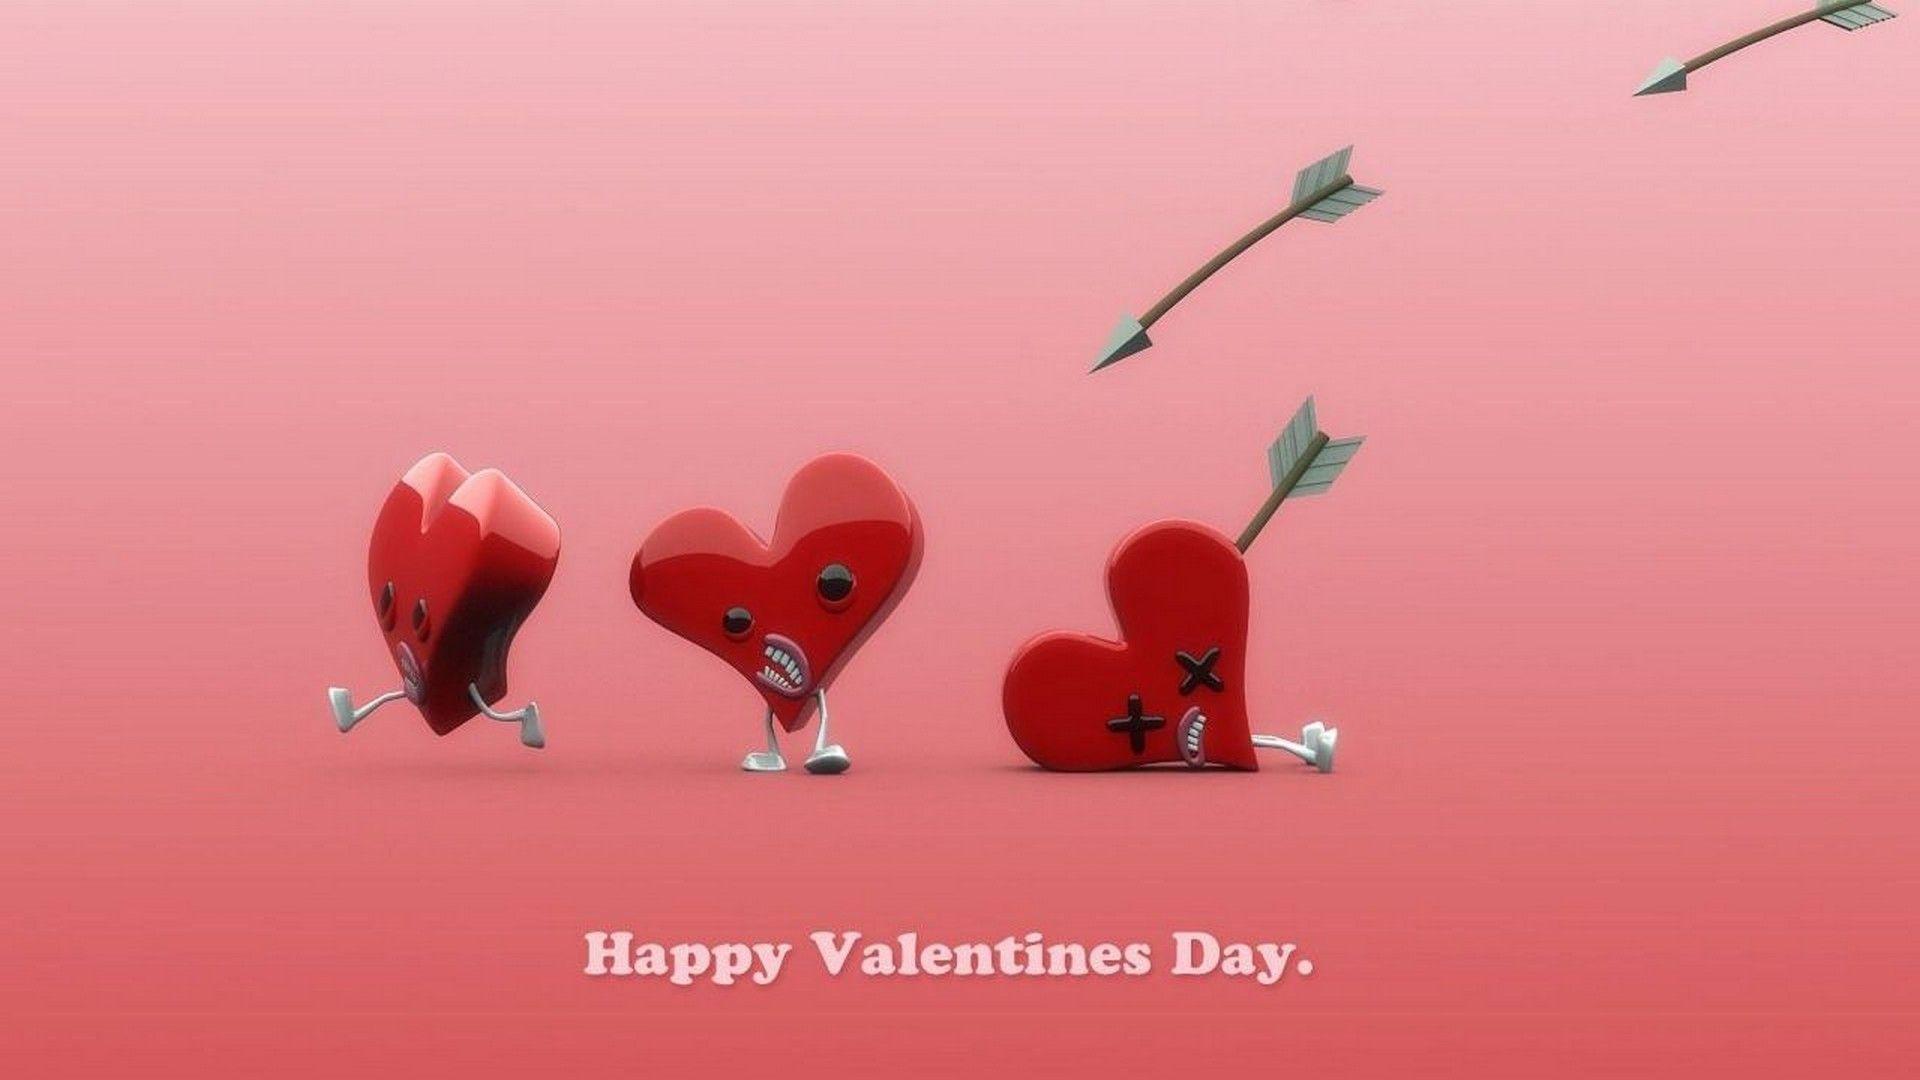 Animated Valentines Day Wallpaper Best Hd Wallpapers Animated Valentines Happy Valentines Day Wishes Beautiful Valentine